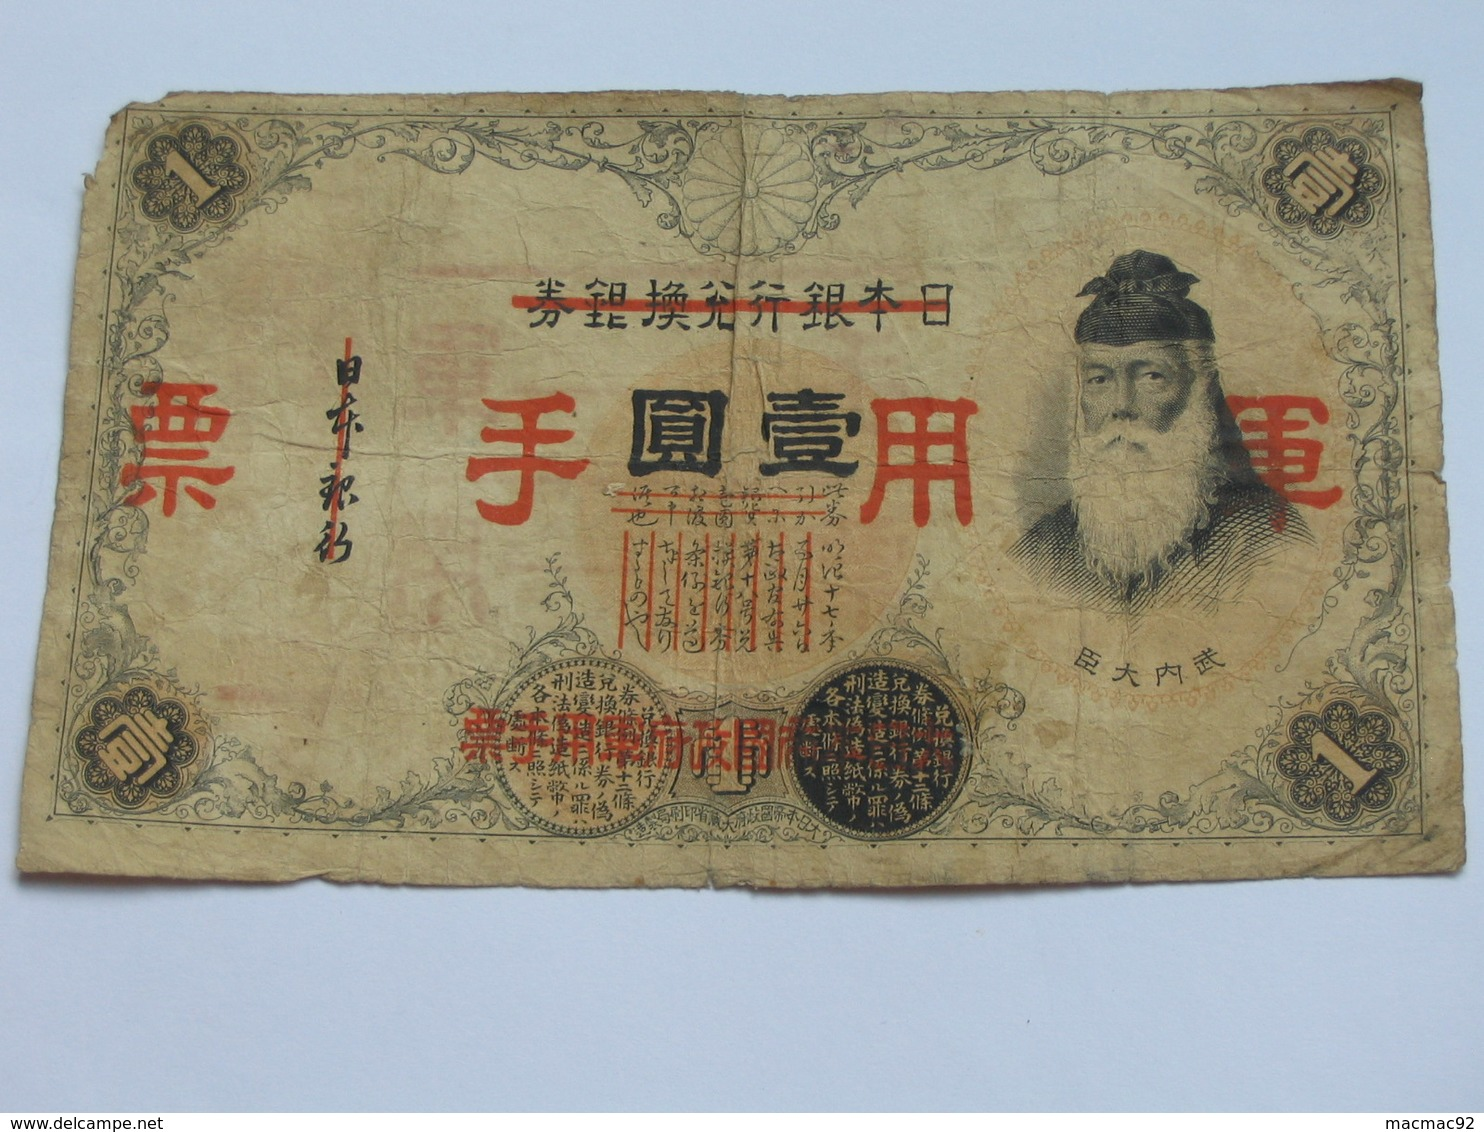 1 Yen 1889 (date A Confirmer) - Japon - Japan **** EN ACHAT IMMEDIAT **** - Japan